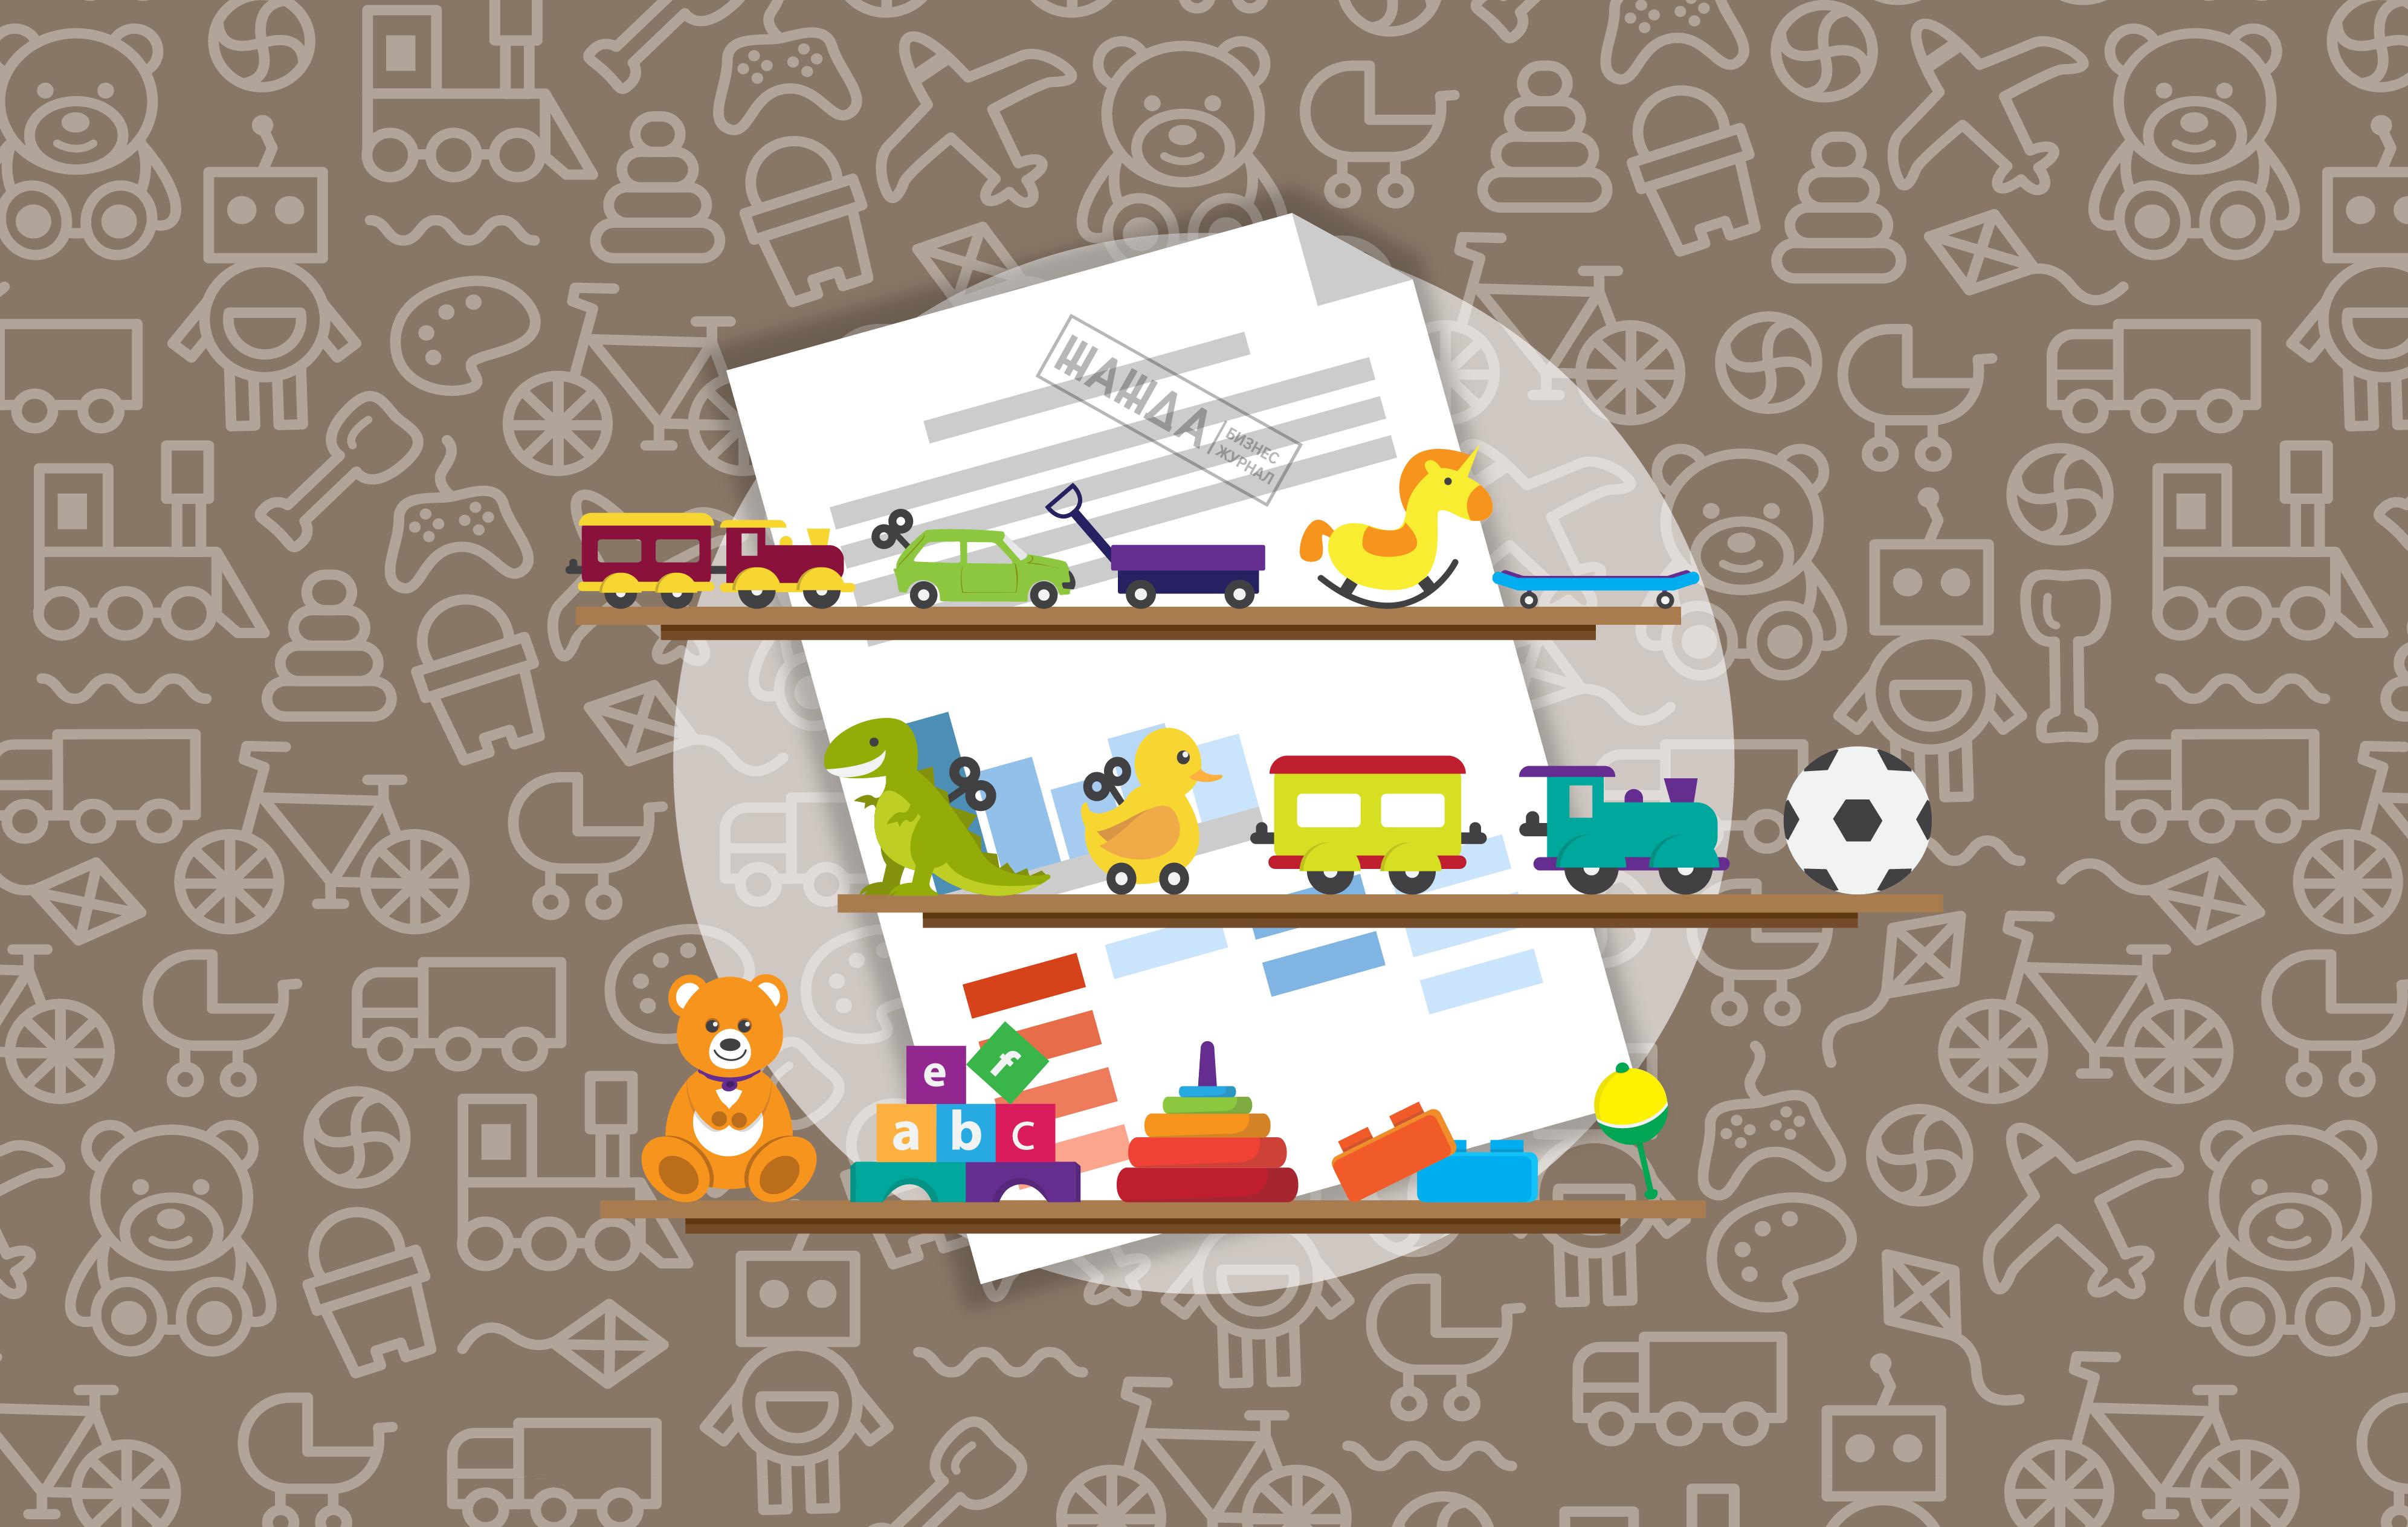 fffc79546019 Бизнес-план магазина игрушек - «Жажда» - бизнес-журнал